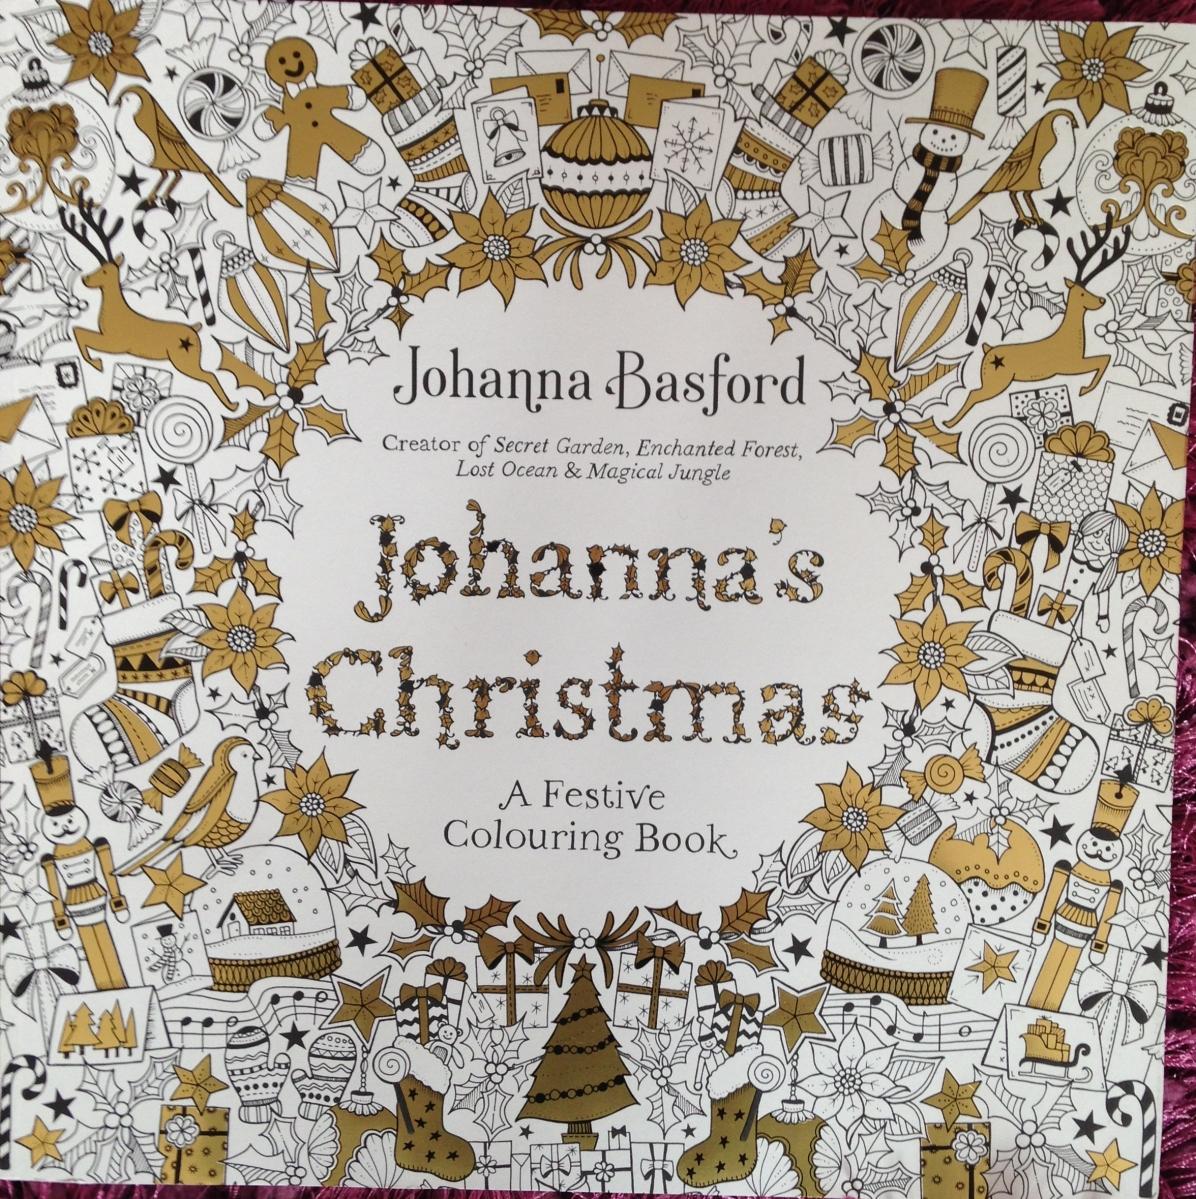 Johanna\'s Christmas by Johanna Basford – Creative Colouring With Hazel